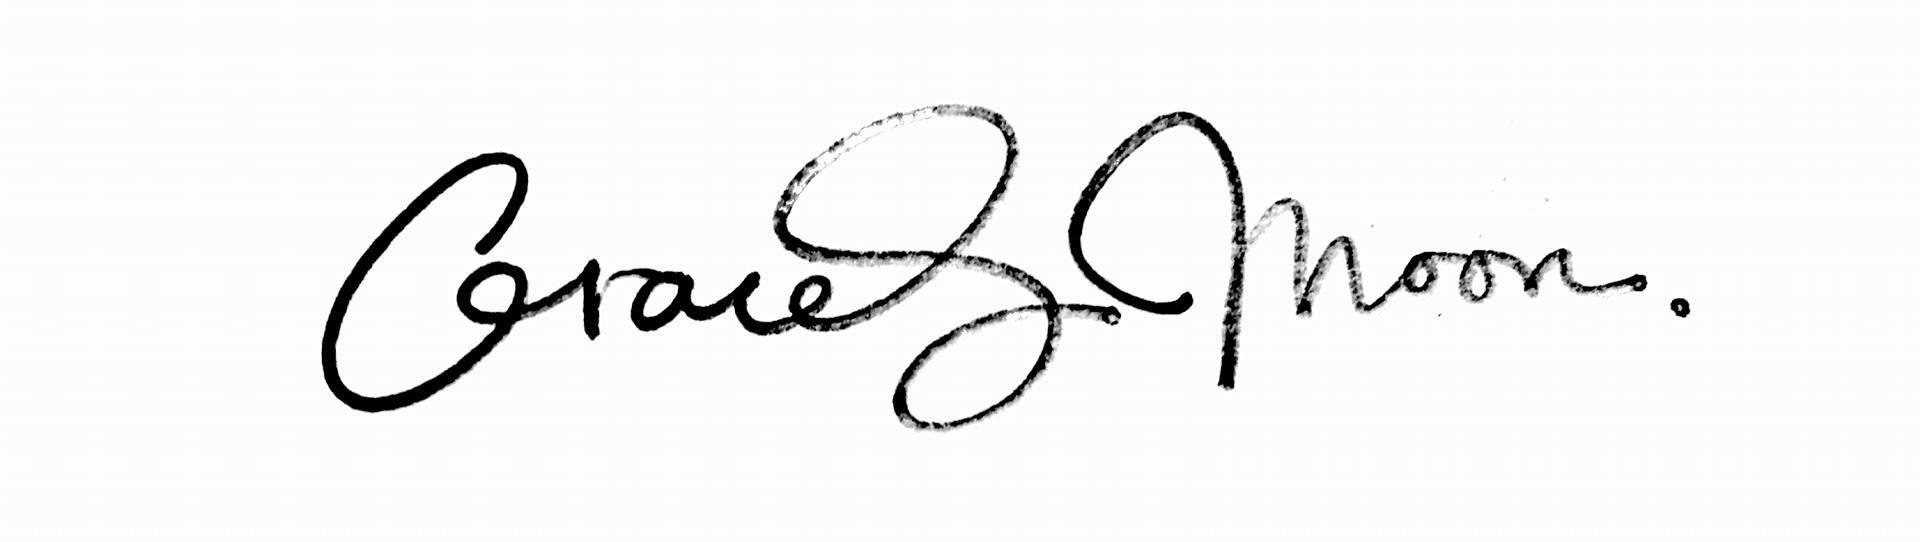 Grace Moon's Signature